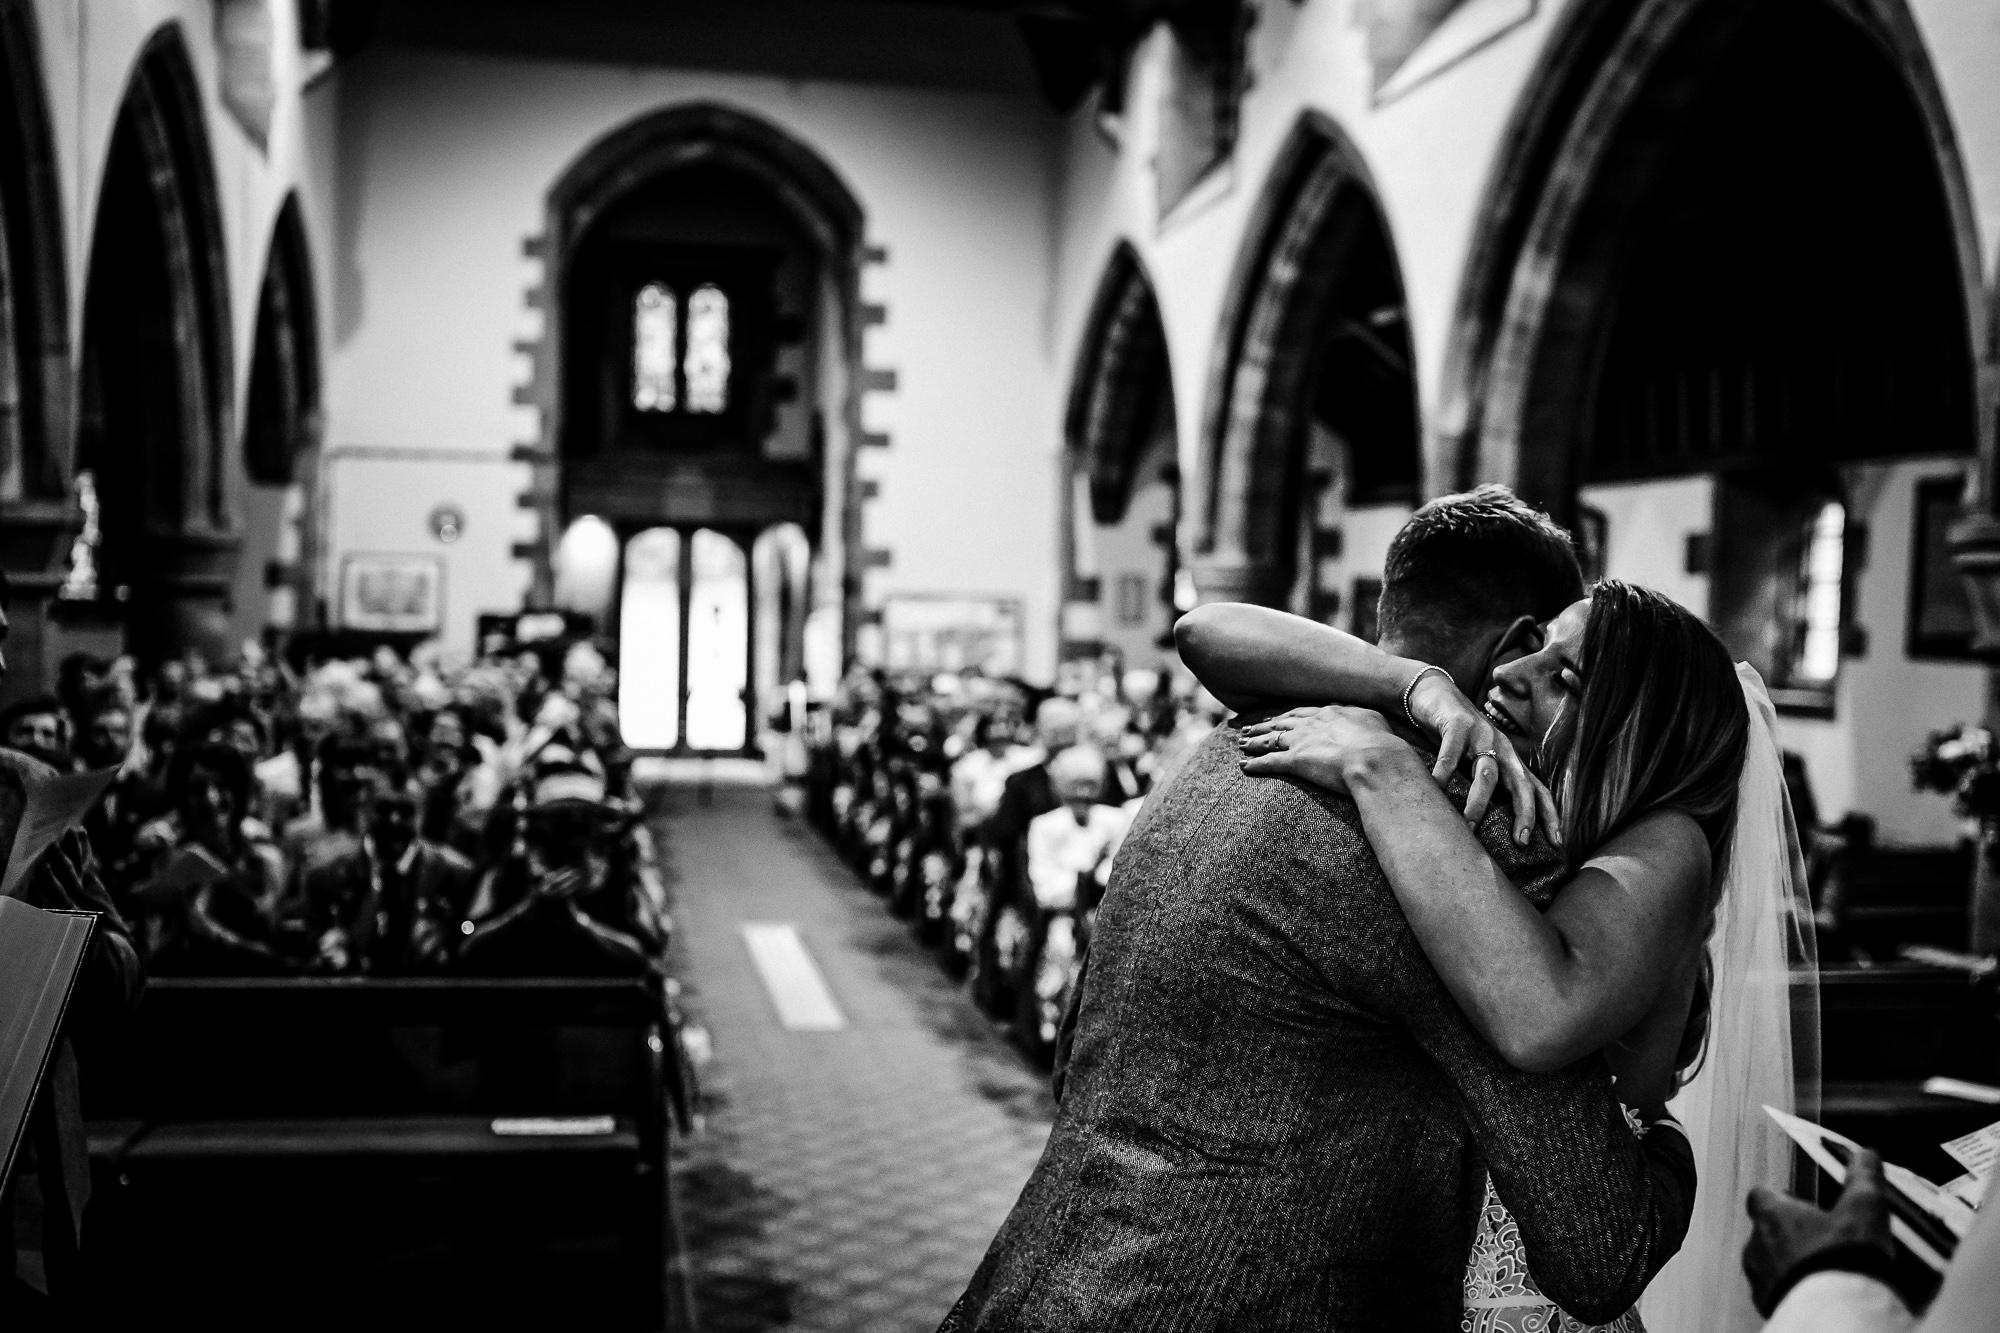 High Barn Wedding photographer lake distect penrith documentry wedding photography (27 of 57).jpg